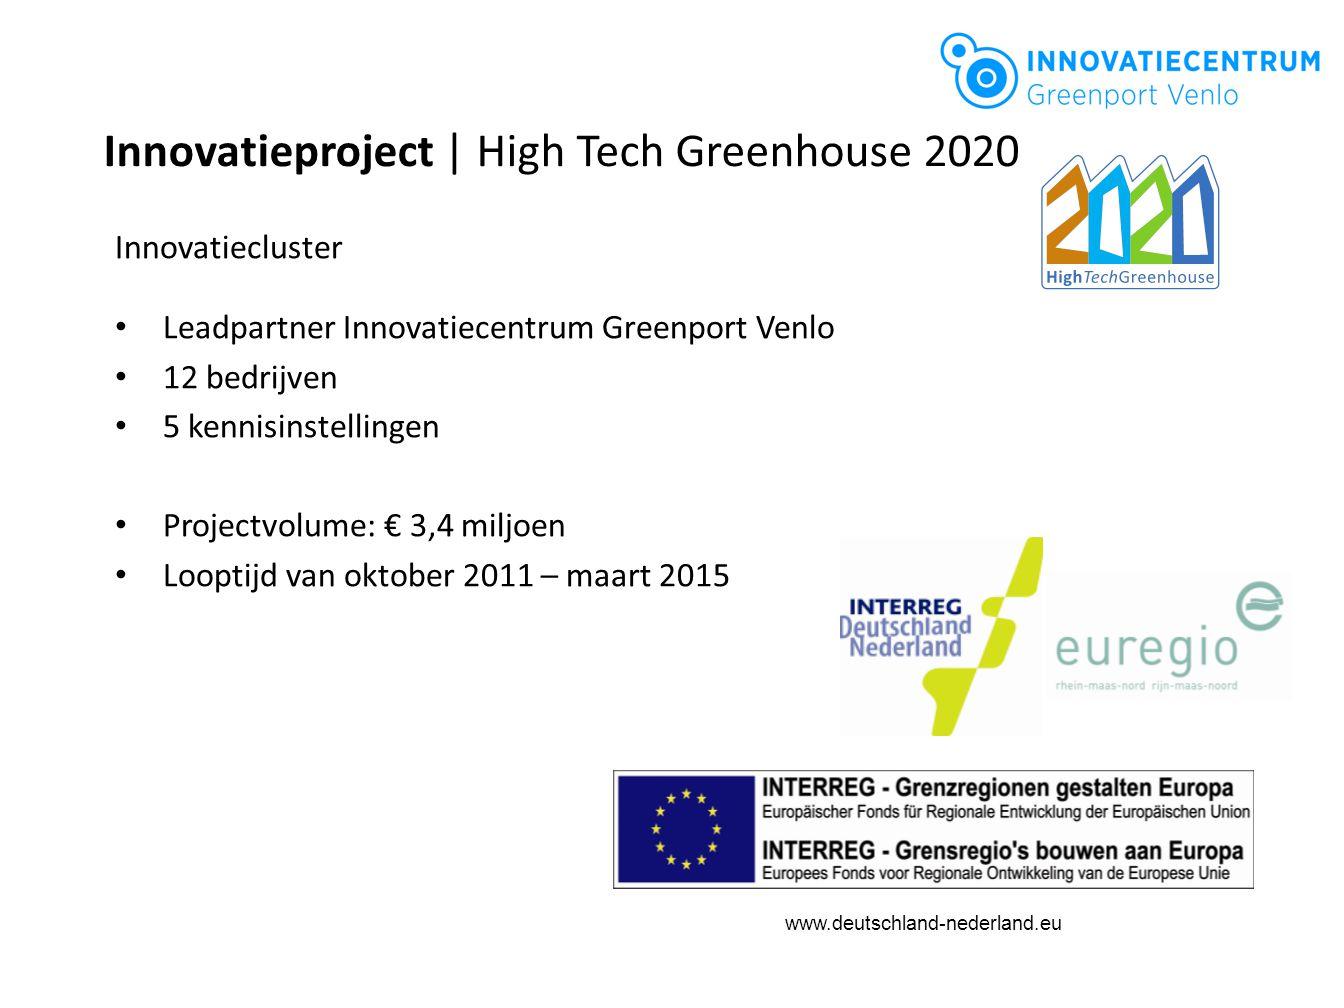 www.deutschland-nederland.eu Innovatieproject | High Tech Greenhouse 2020 Innovatiecluster Leadpartner Innovatiecentrum Greenport Venlo 12 bedrijven 5